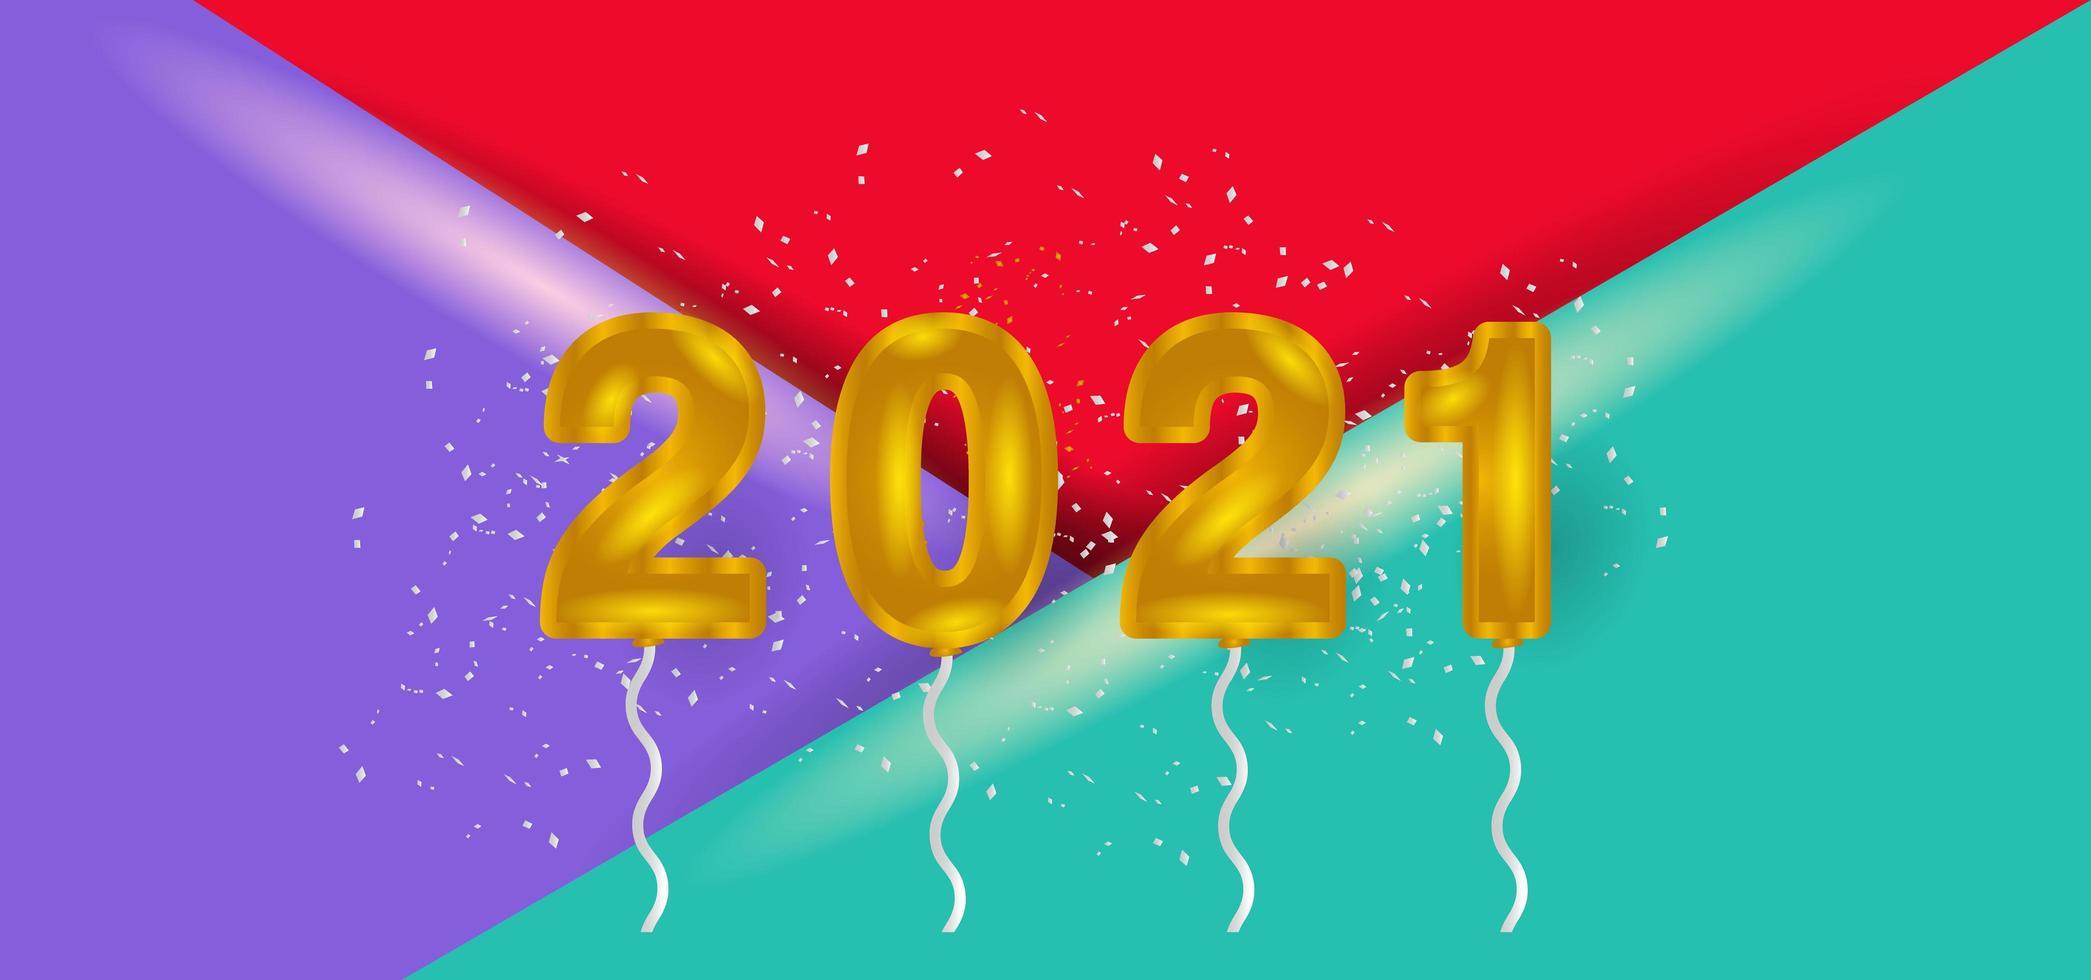 gyllene 2021 ballonger på färgglada glansiga trianglar vektor